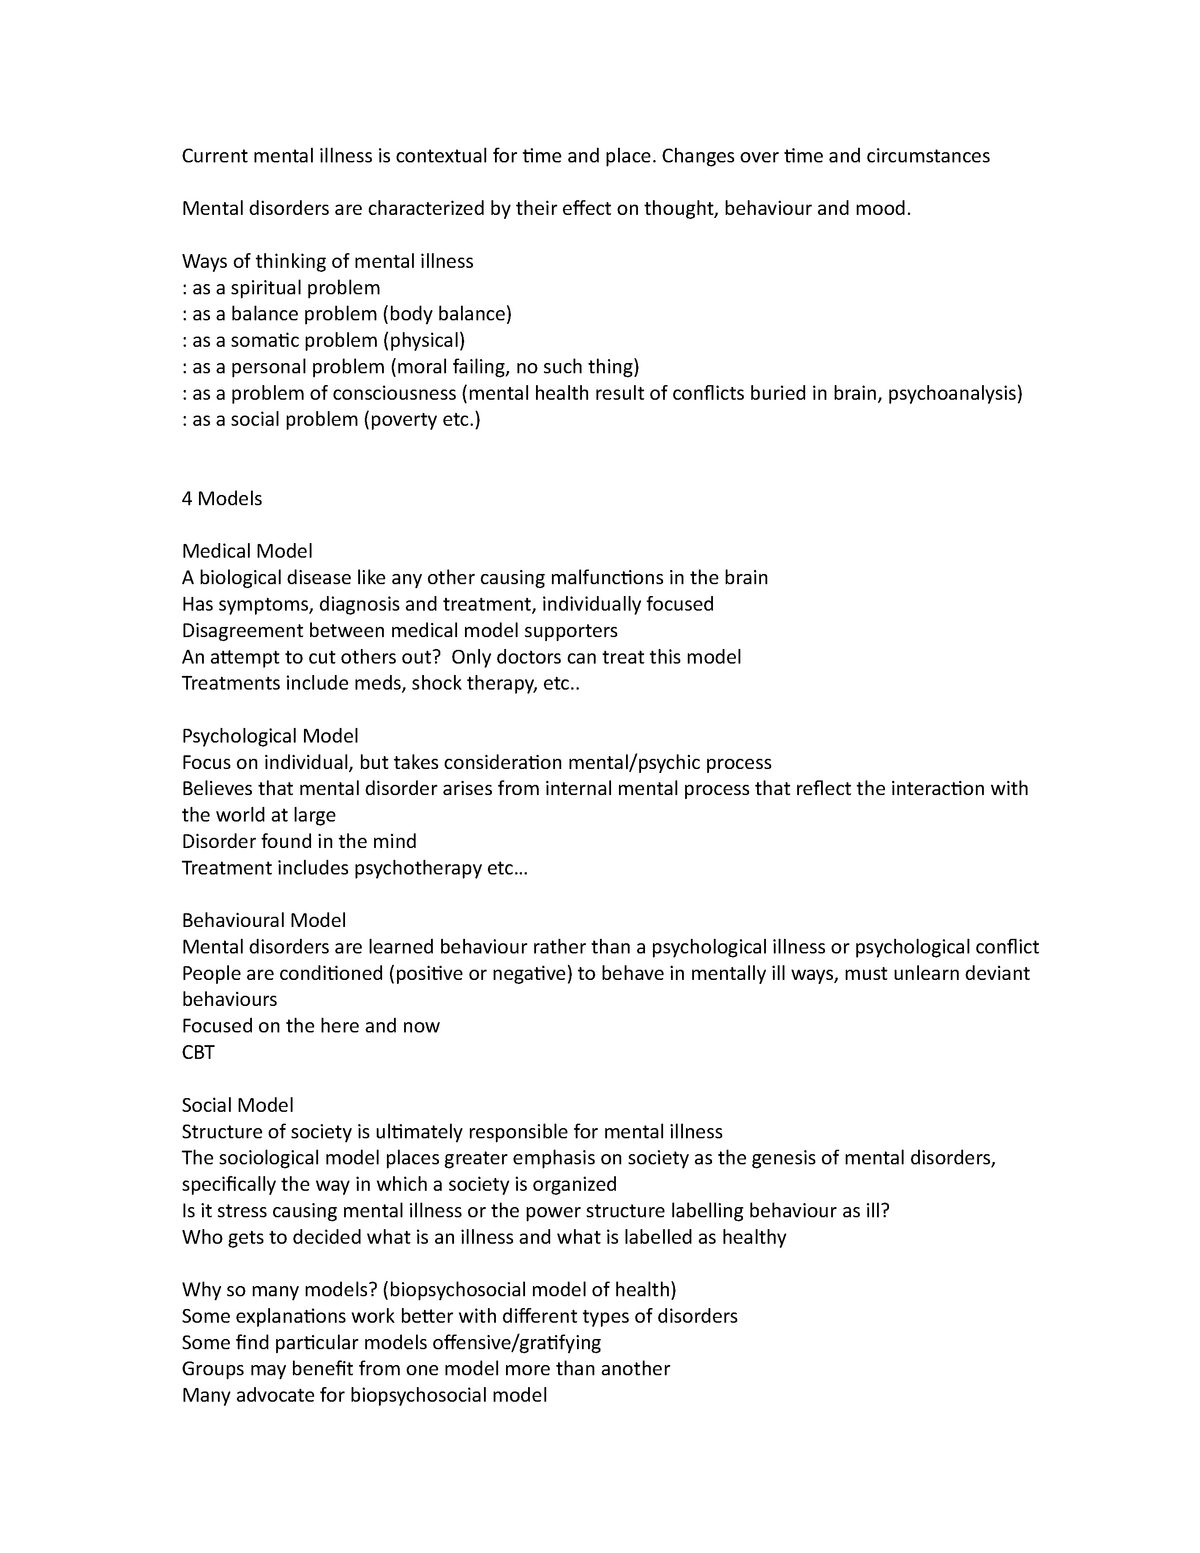 Test 2 Study Notes - HLTHAGE 1CC3 - McMaster - StuDocu